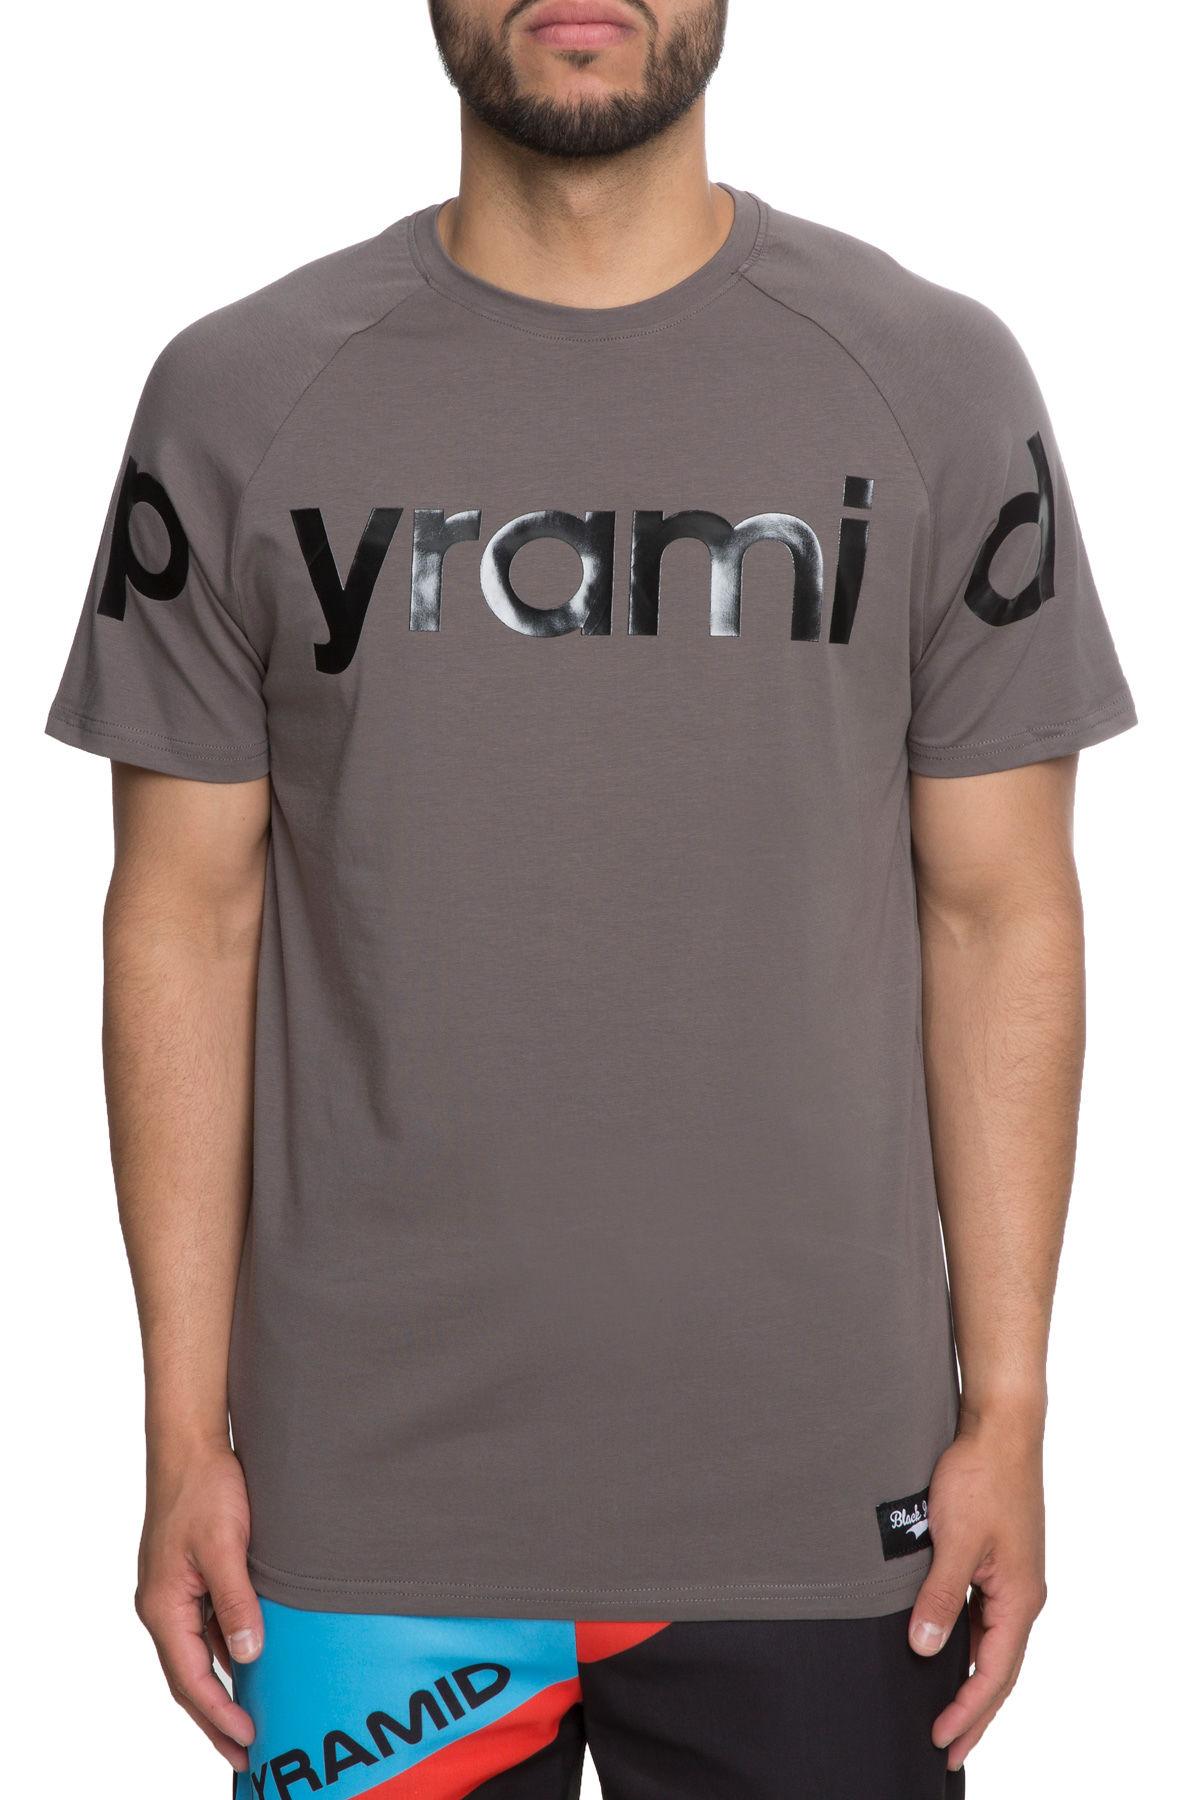 the pyramid raglan tee in grey